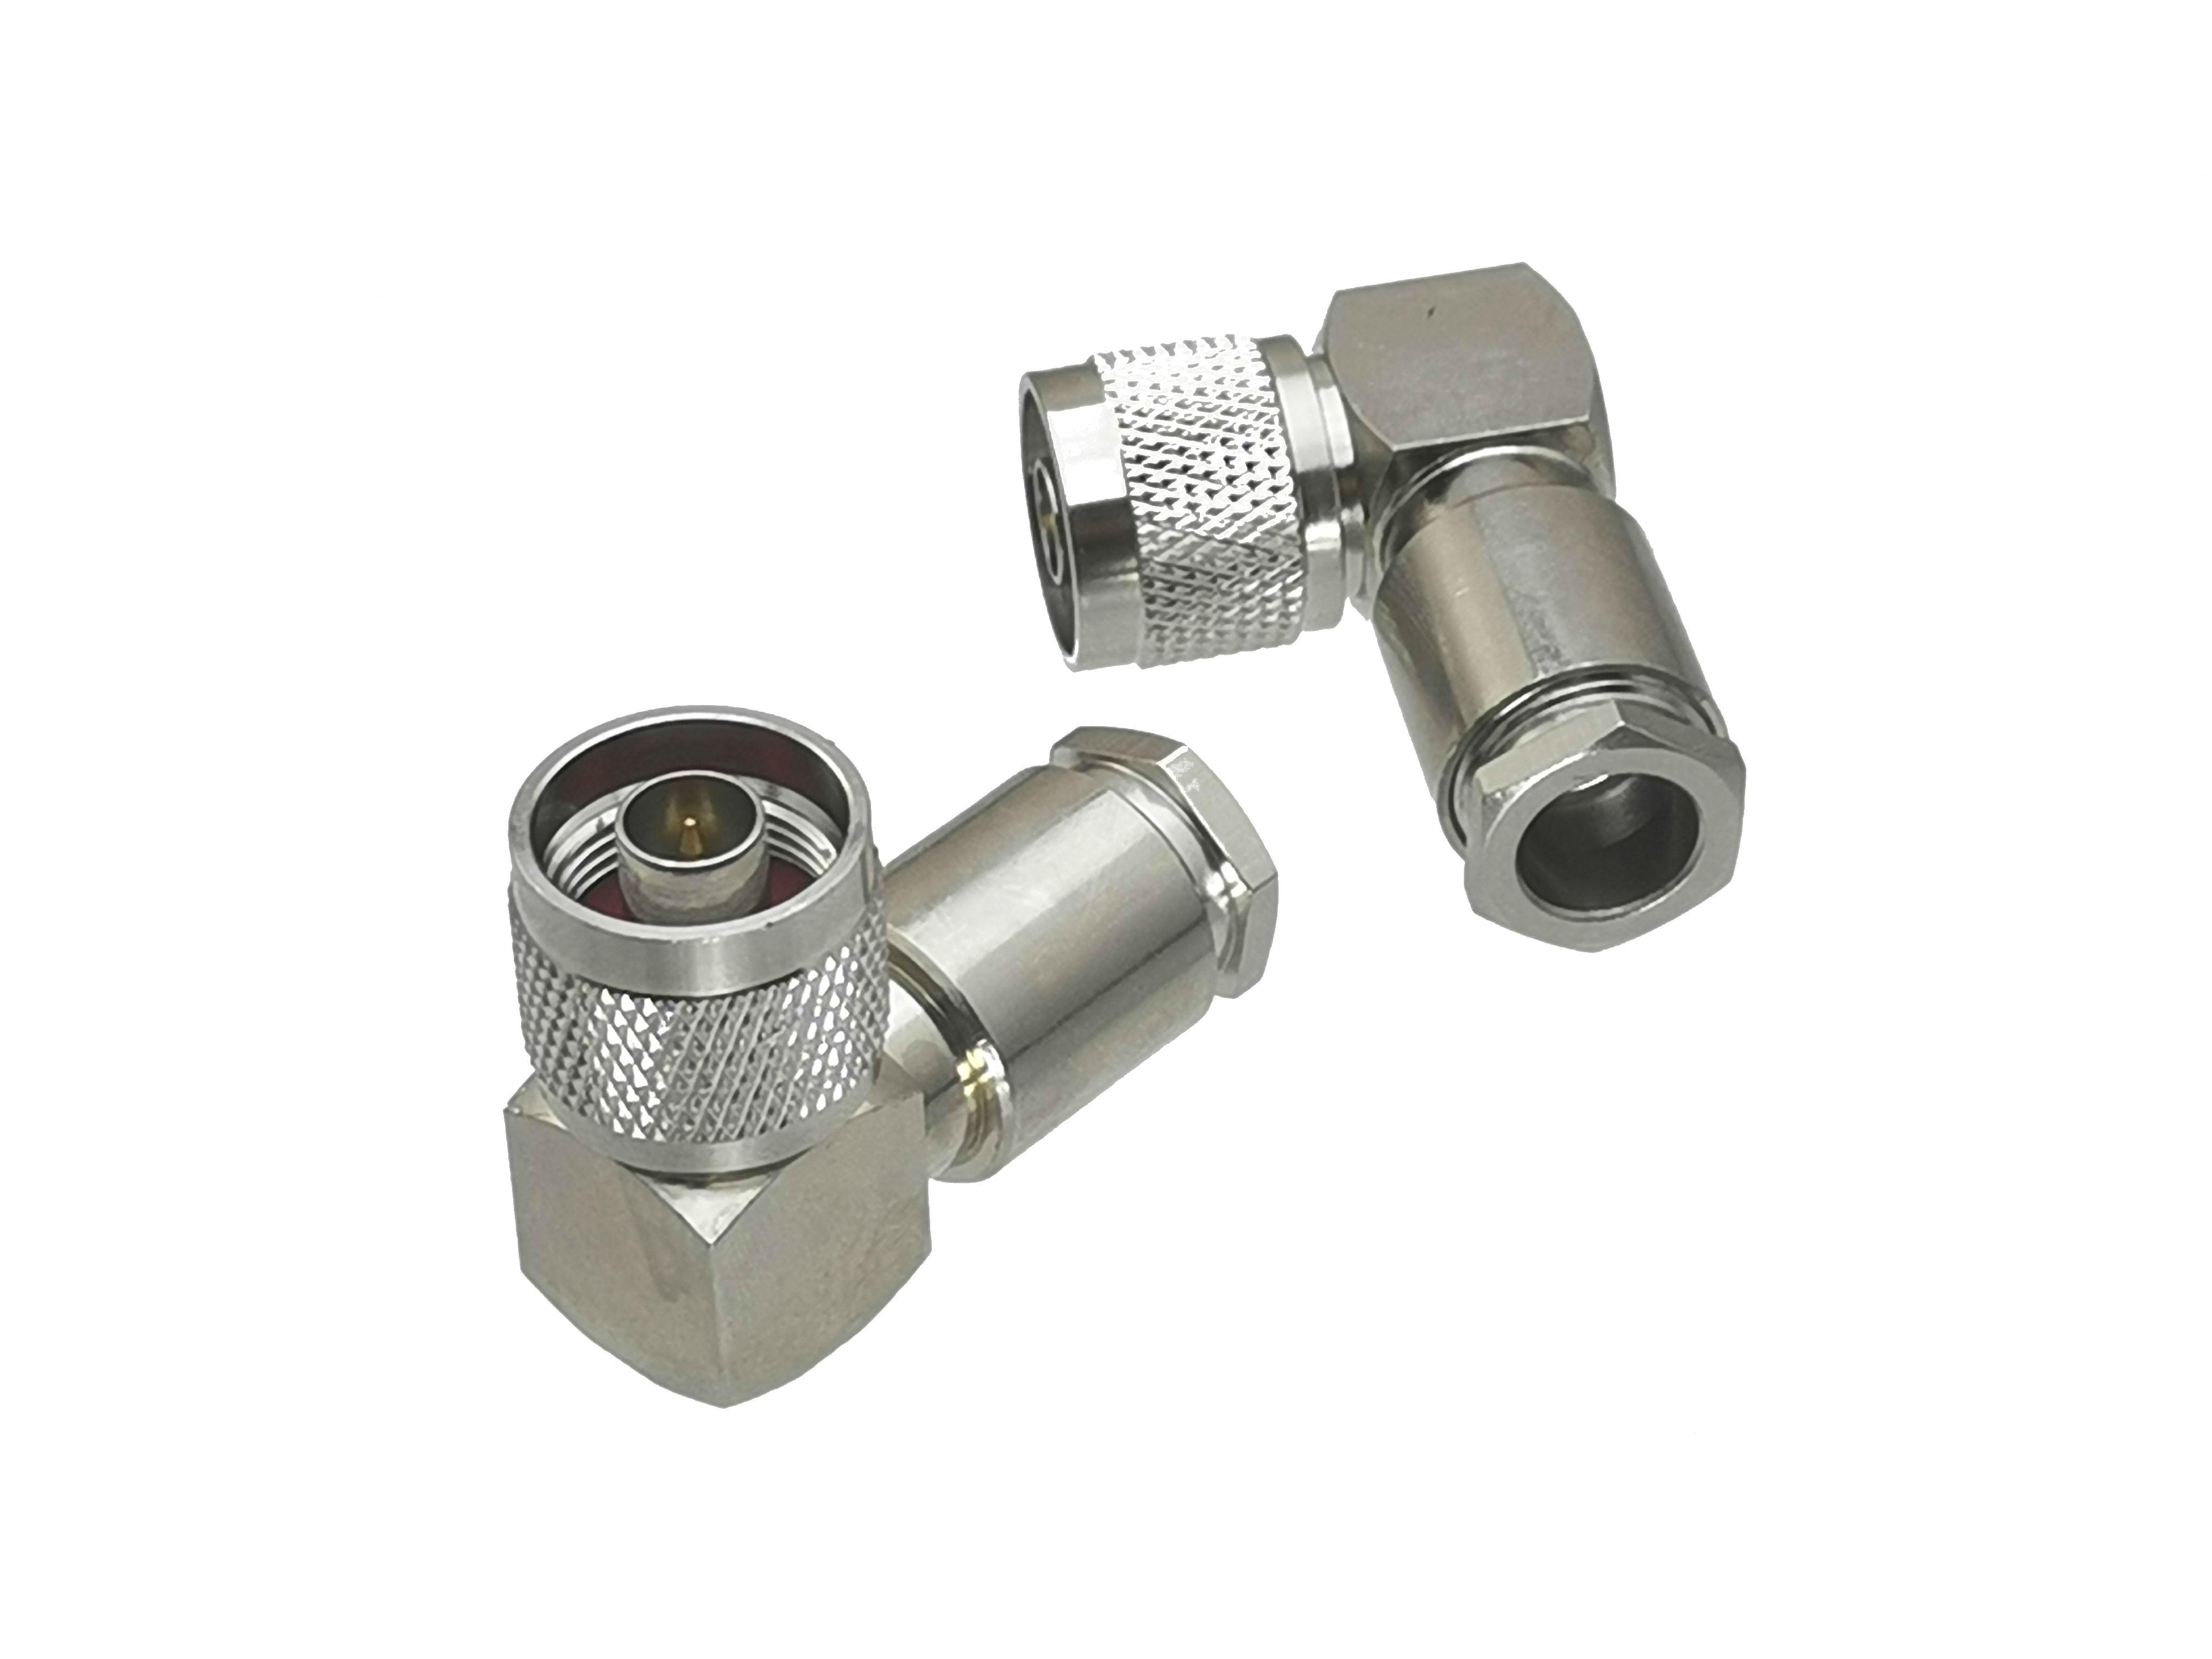 5pcs Connector N Male Plug Clamp RG8 RG213 LMR400 RG214 9913 Right Angle